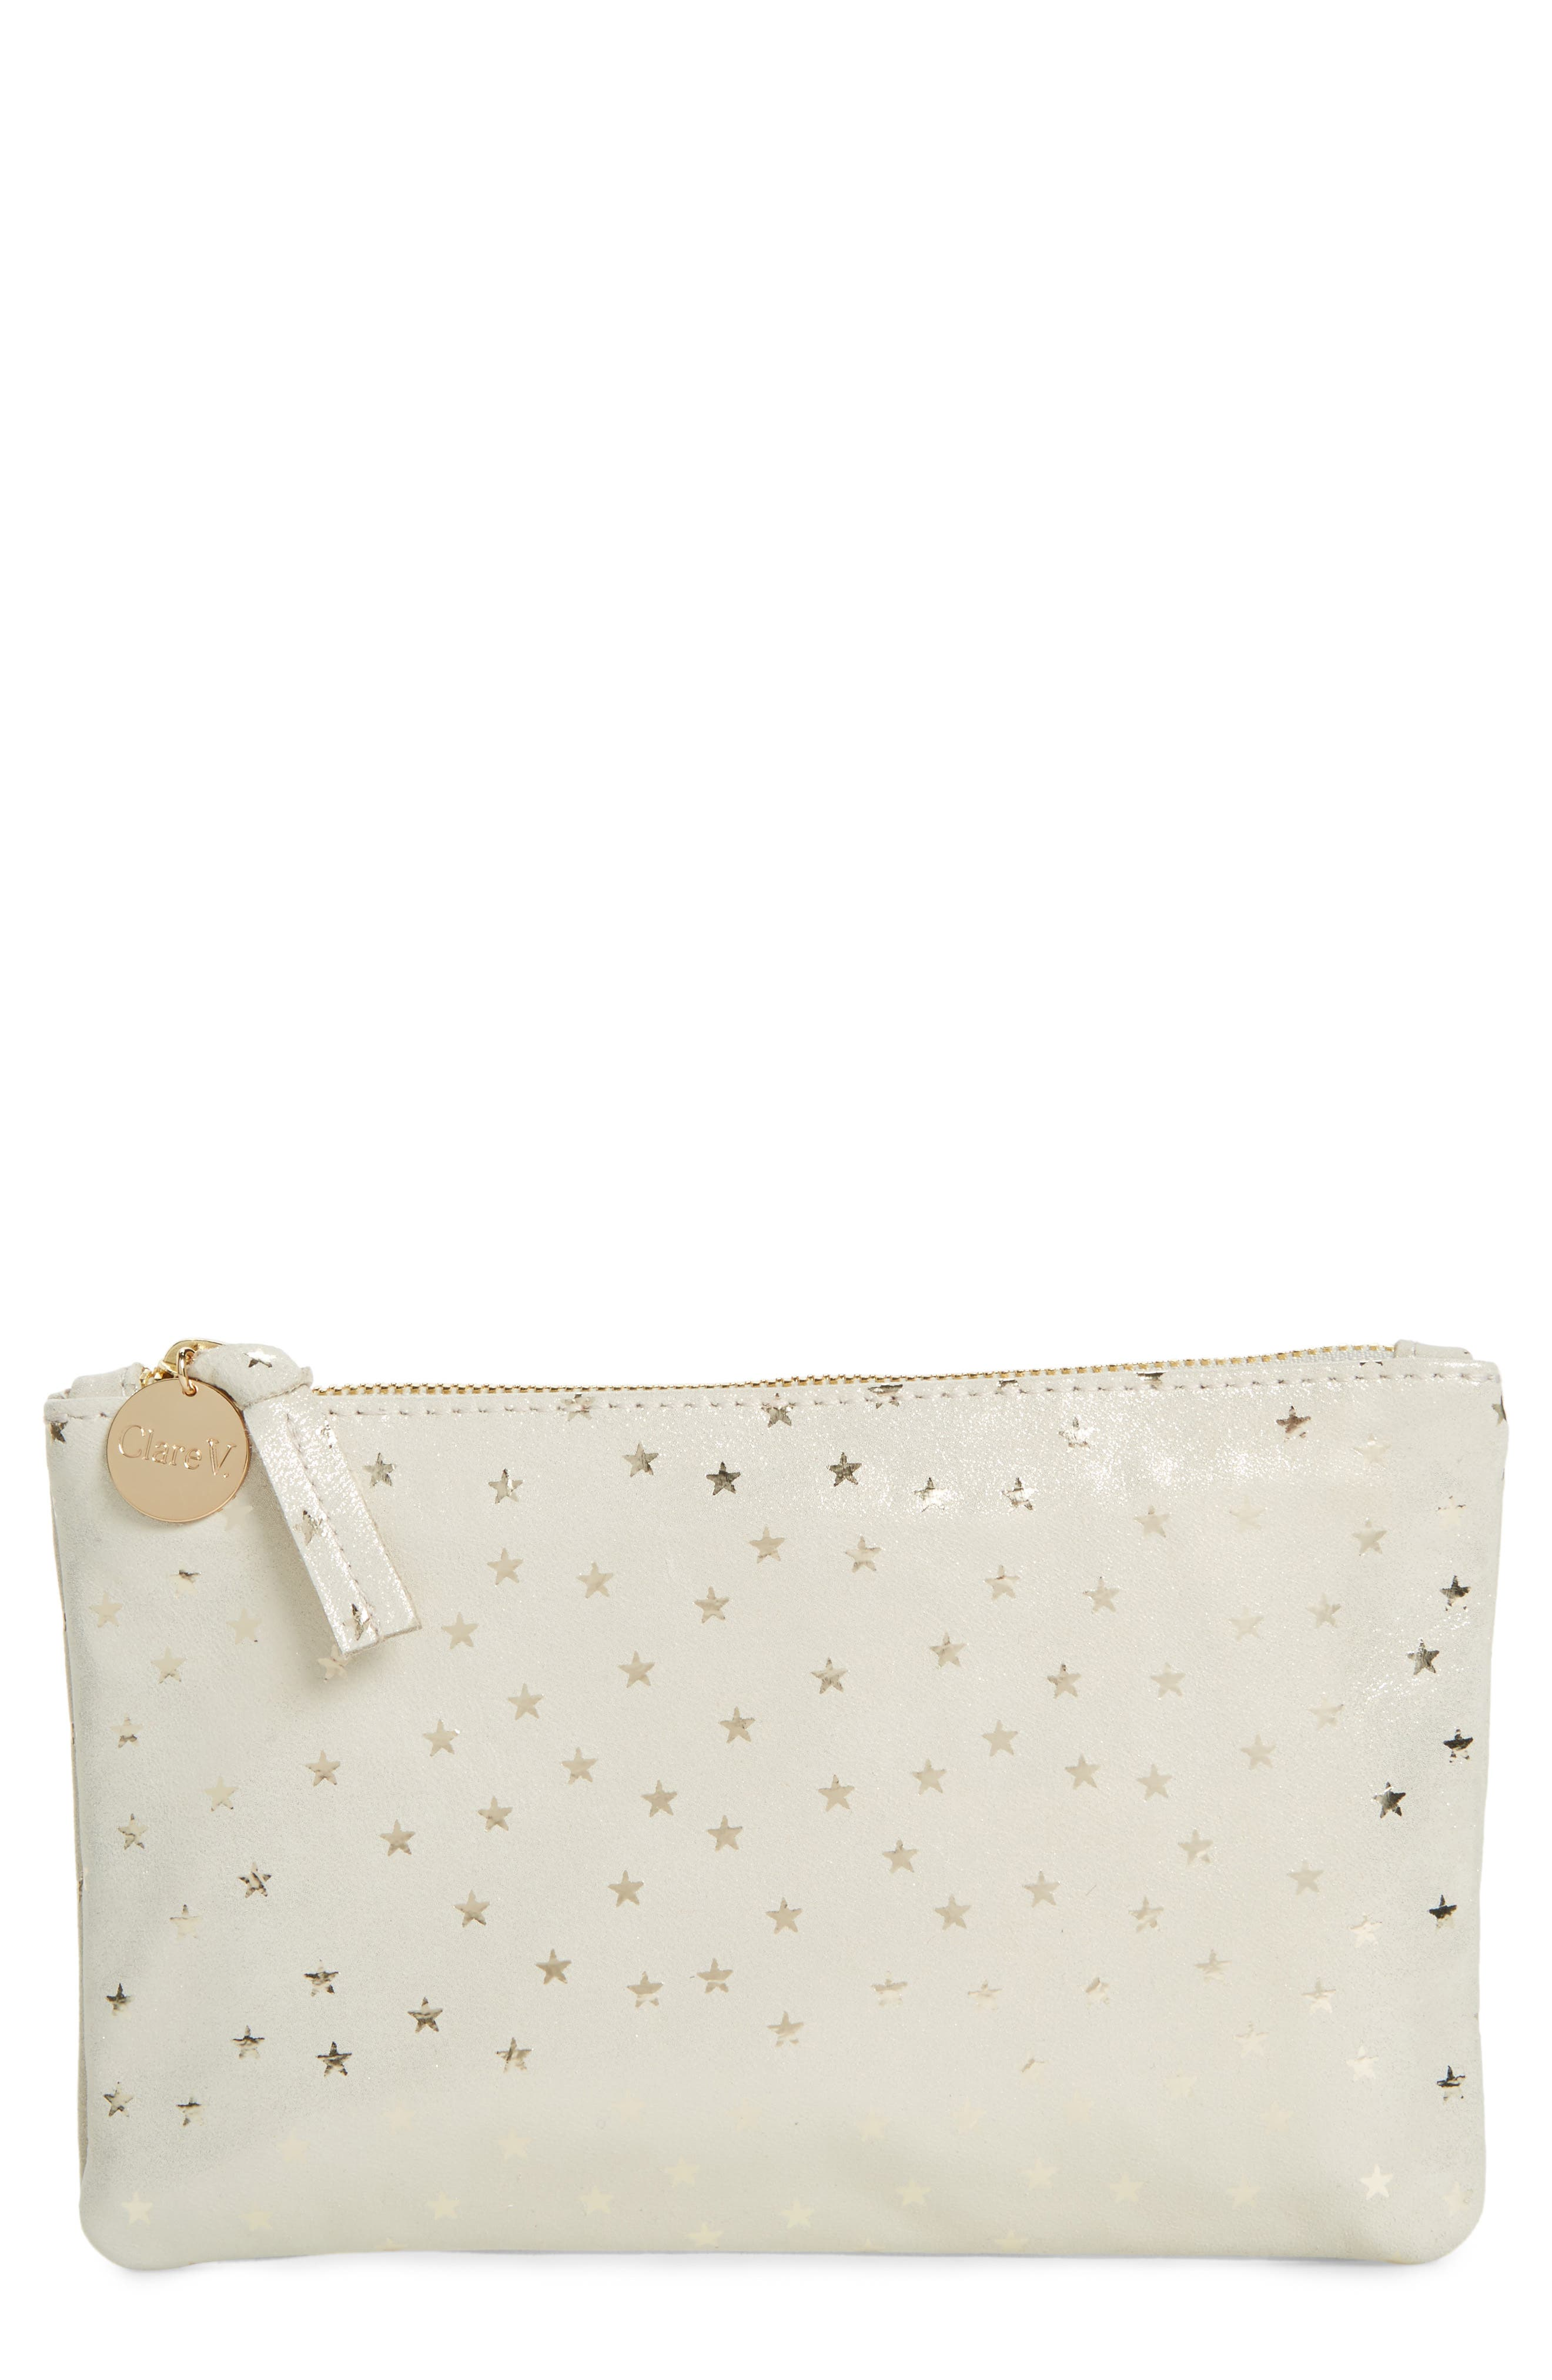 Supreme Star Shimmer Suede Wallet Clutch,                         Main,                         color, 900